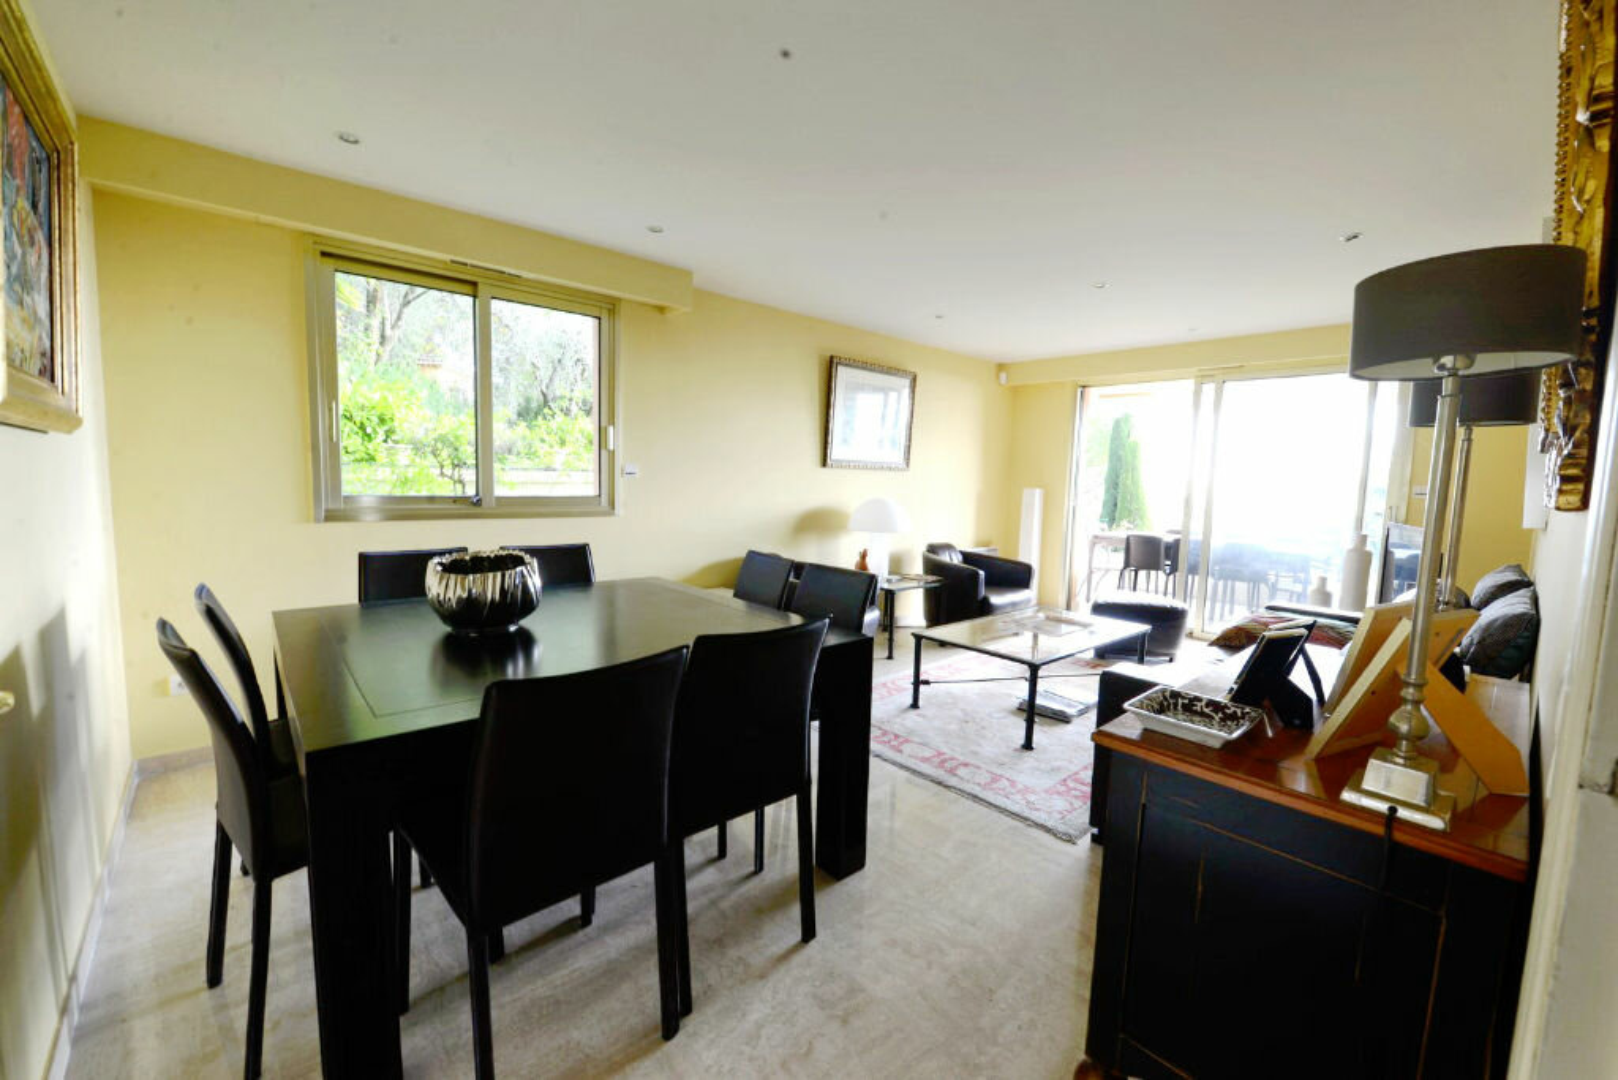 Appartement à vendre 3 69.3m2 à Grasse vignette-2